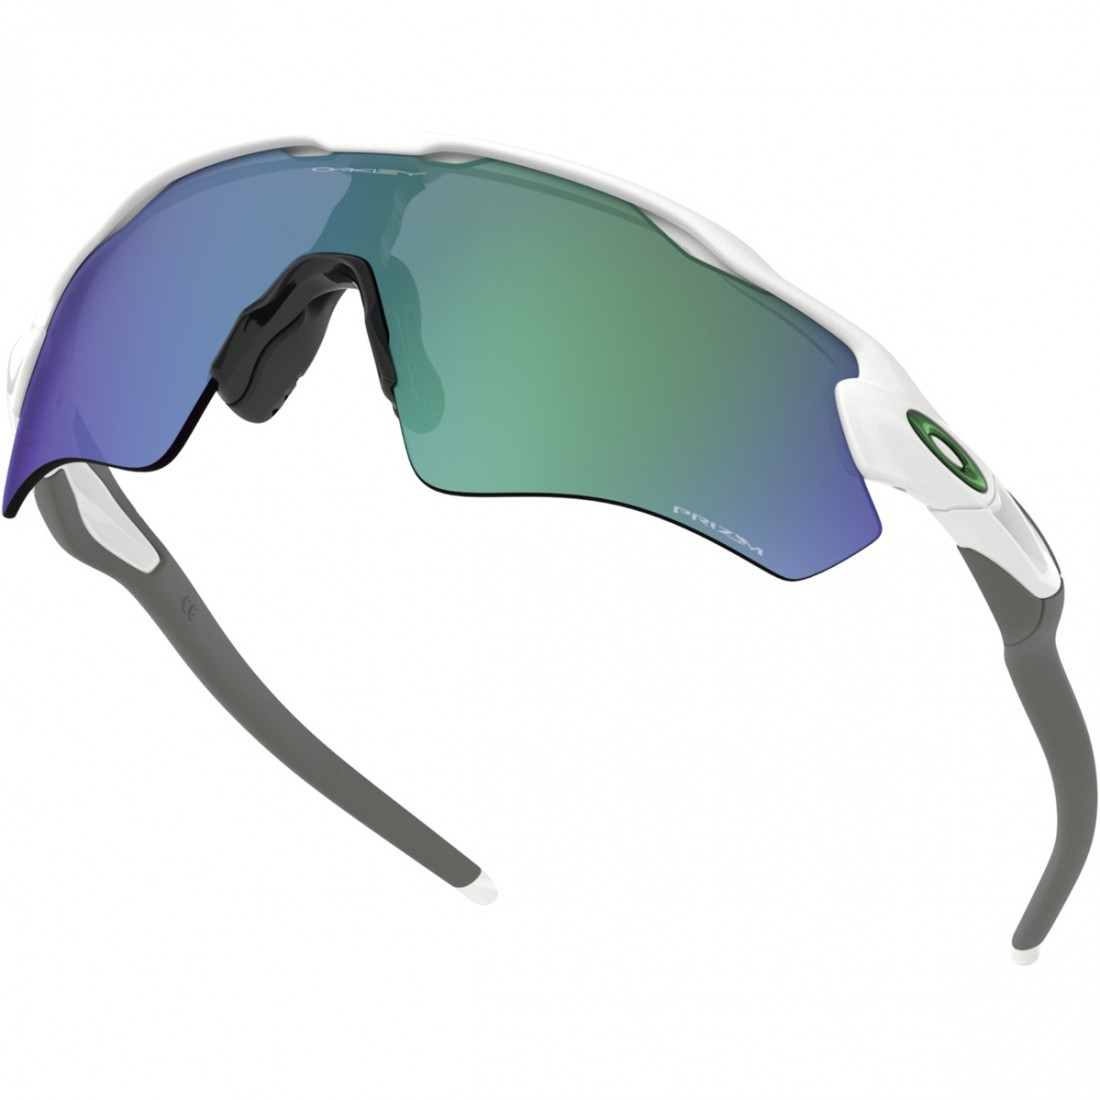 6c4bcf847e OAKLEY Radar EV Path Team Colors Polished White   Prizm Jade Mask   Goggle